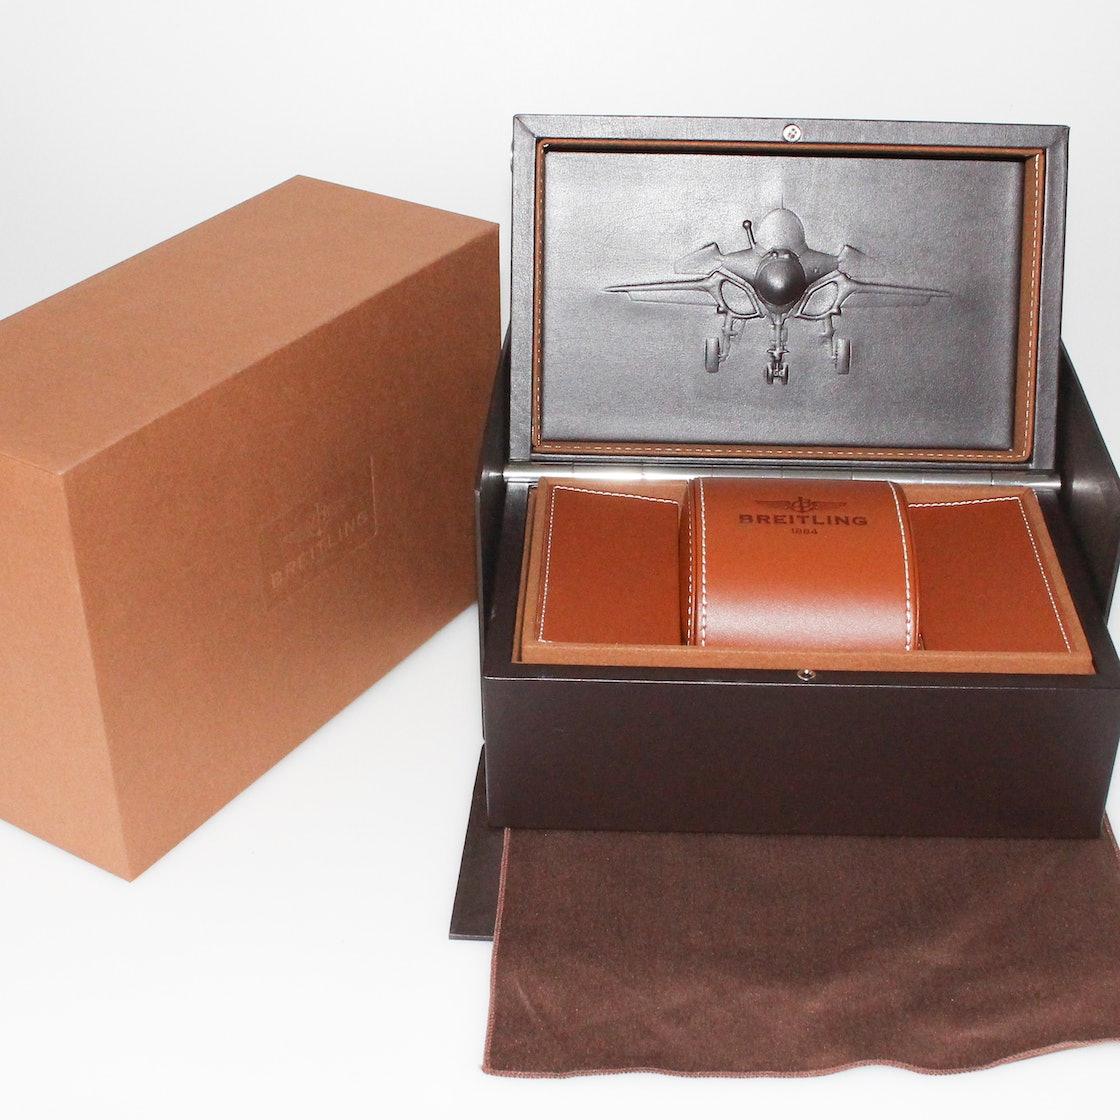 Breitling Transocean Chronograph Unitime RB0510U0/A733